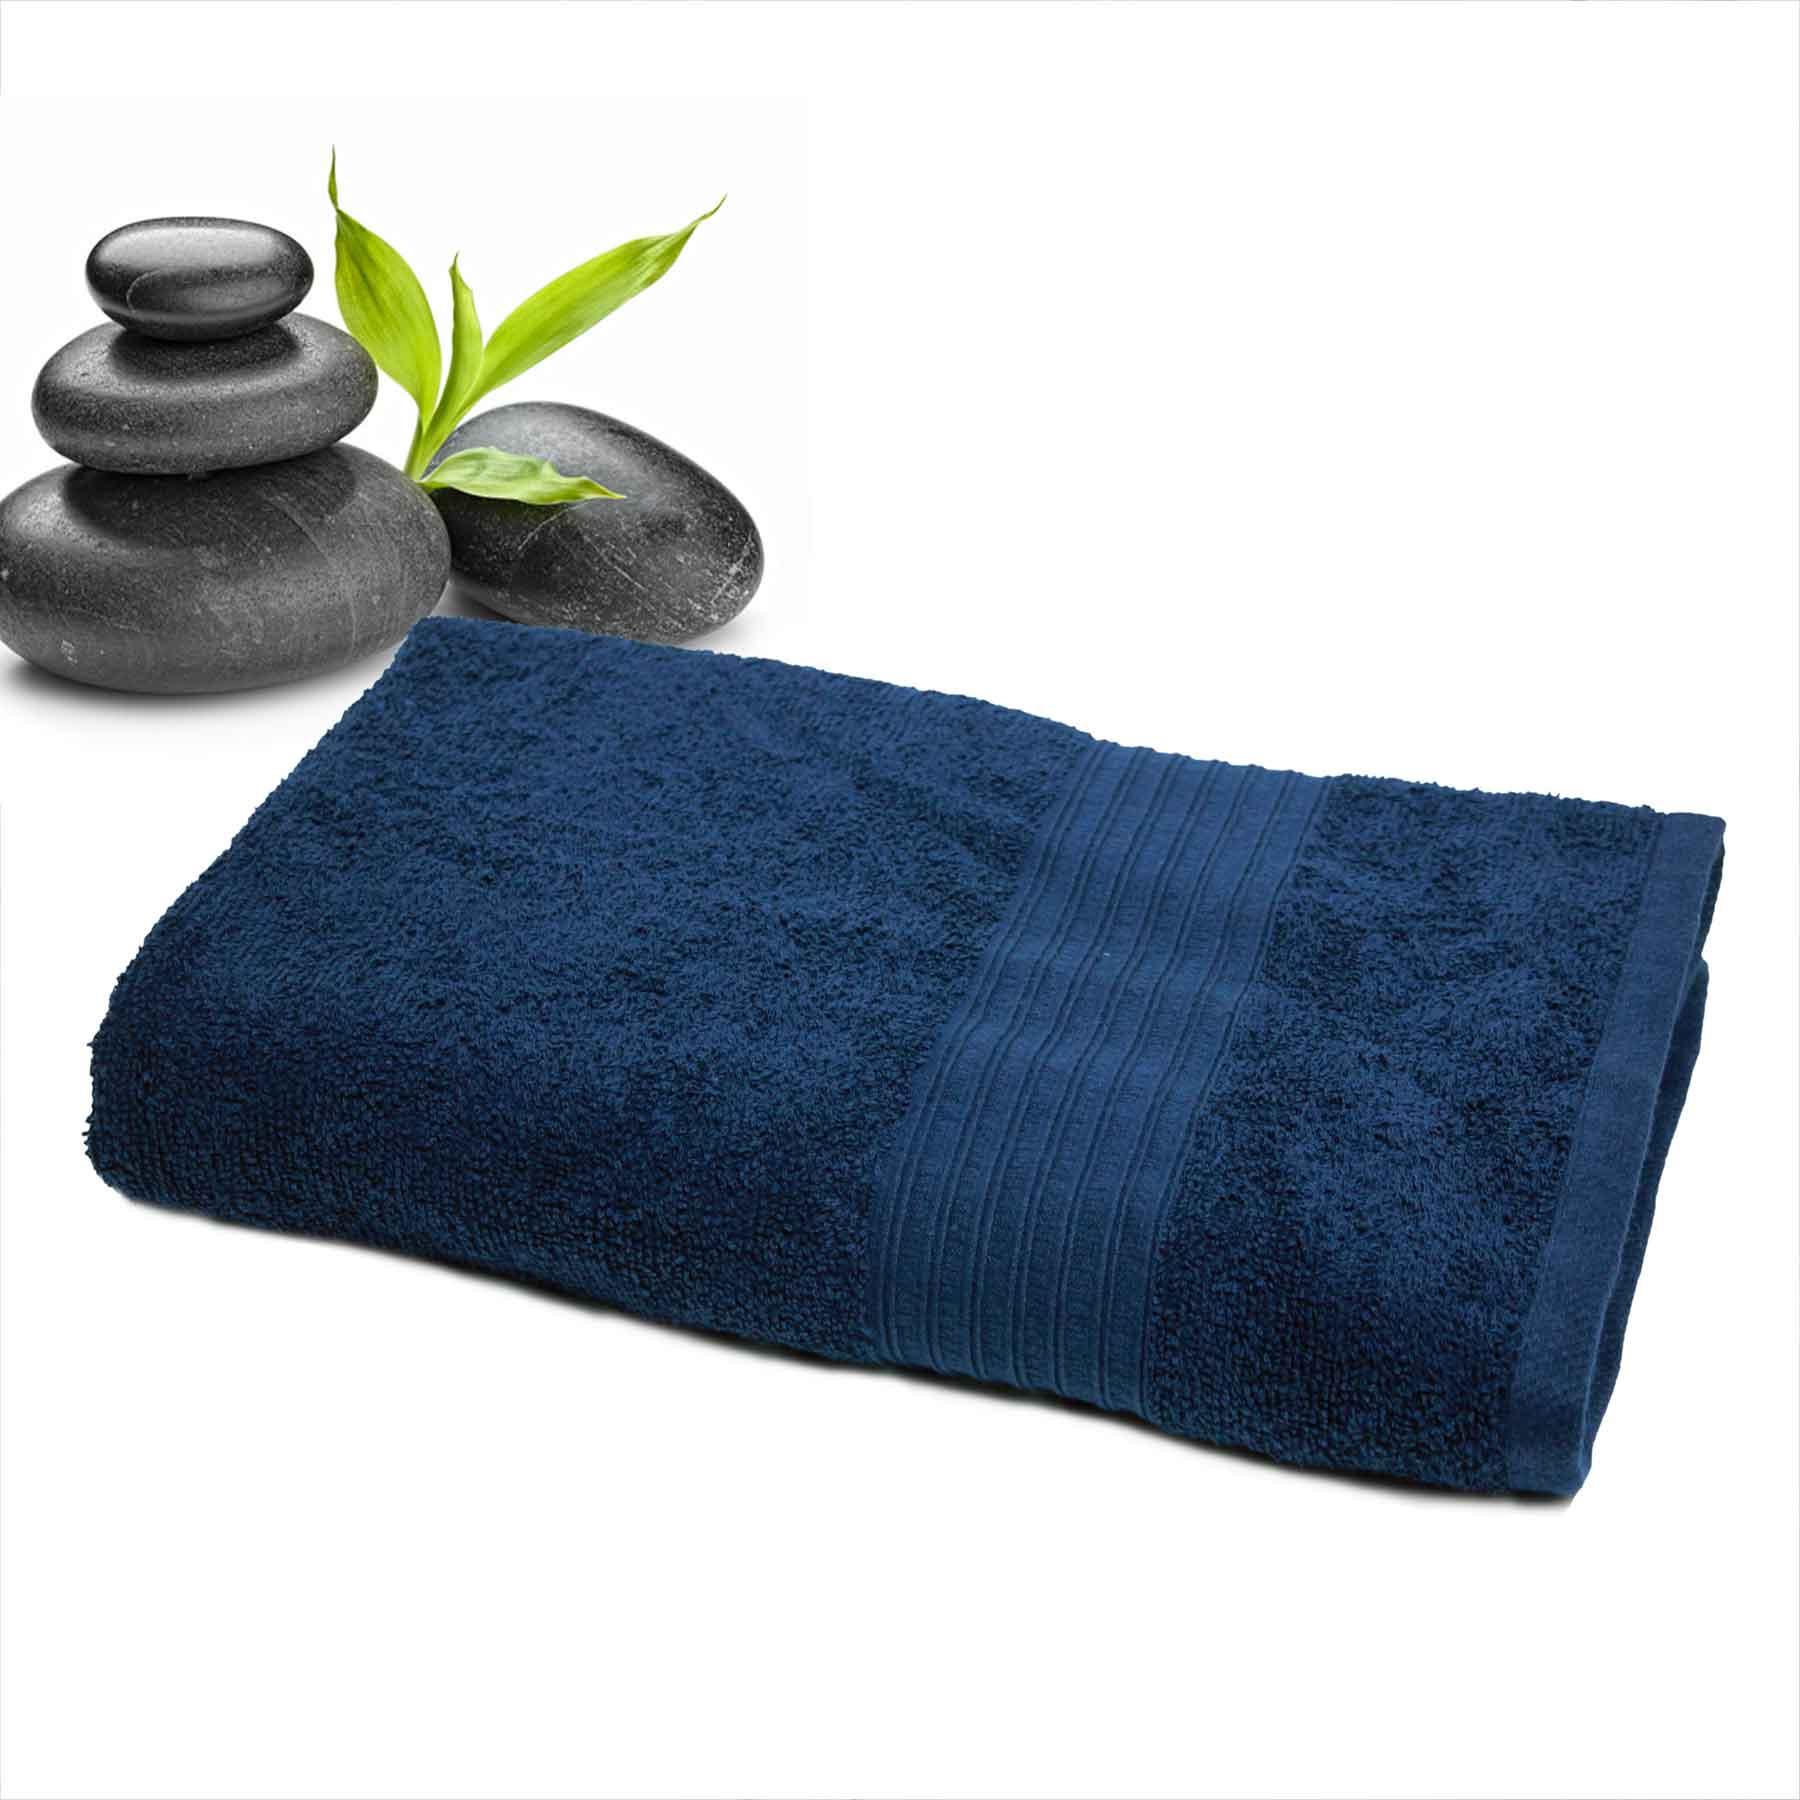 DIVINE CASA Single Cotton Bath Towel Navy (Ladies)